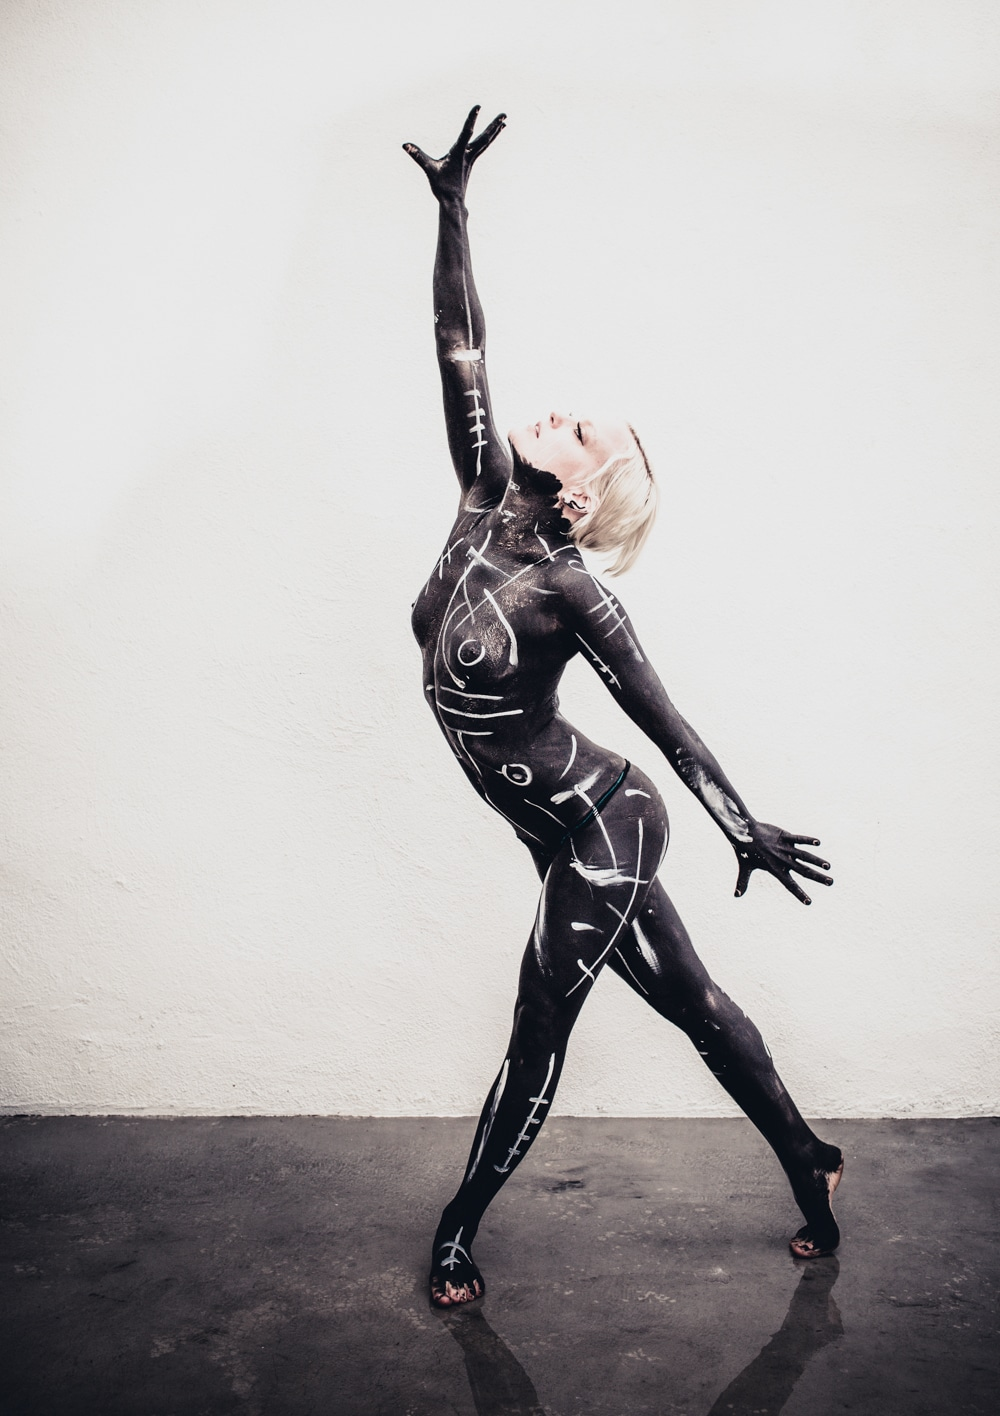 pole_dance_ancient_lines_beylerian_7